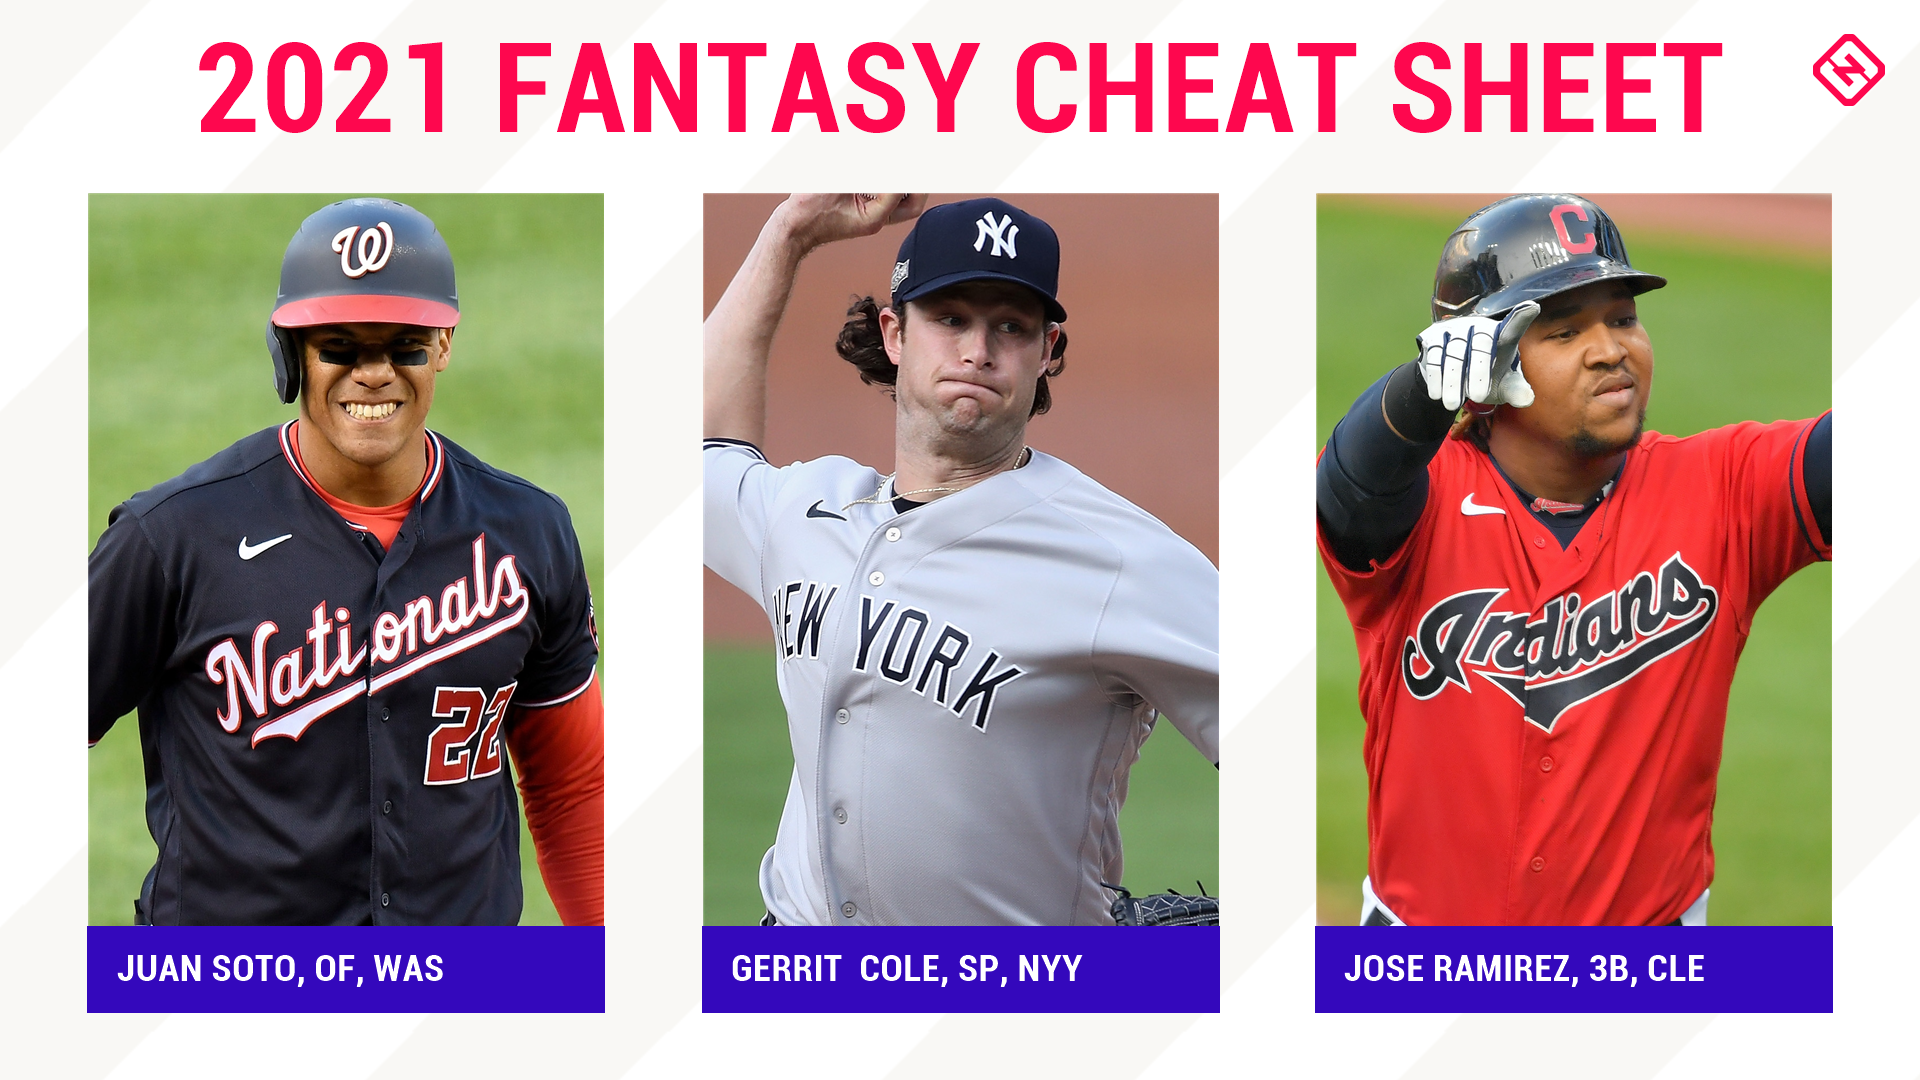 2021 Fantasy Baseball Cheat Sheet: Rankings, sleep, main solutions, auction values, levels, team names, more